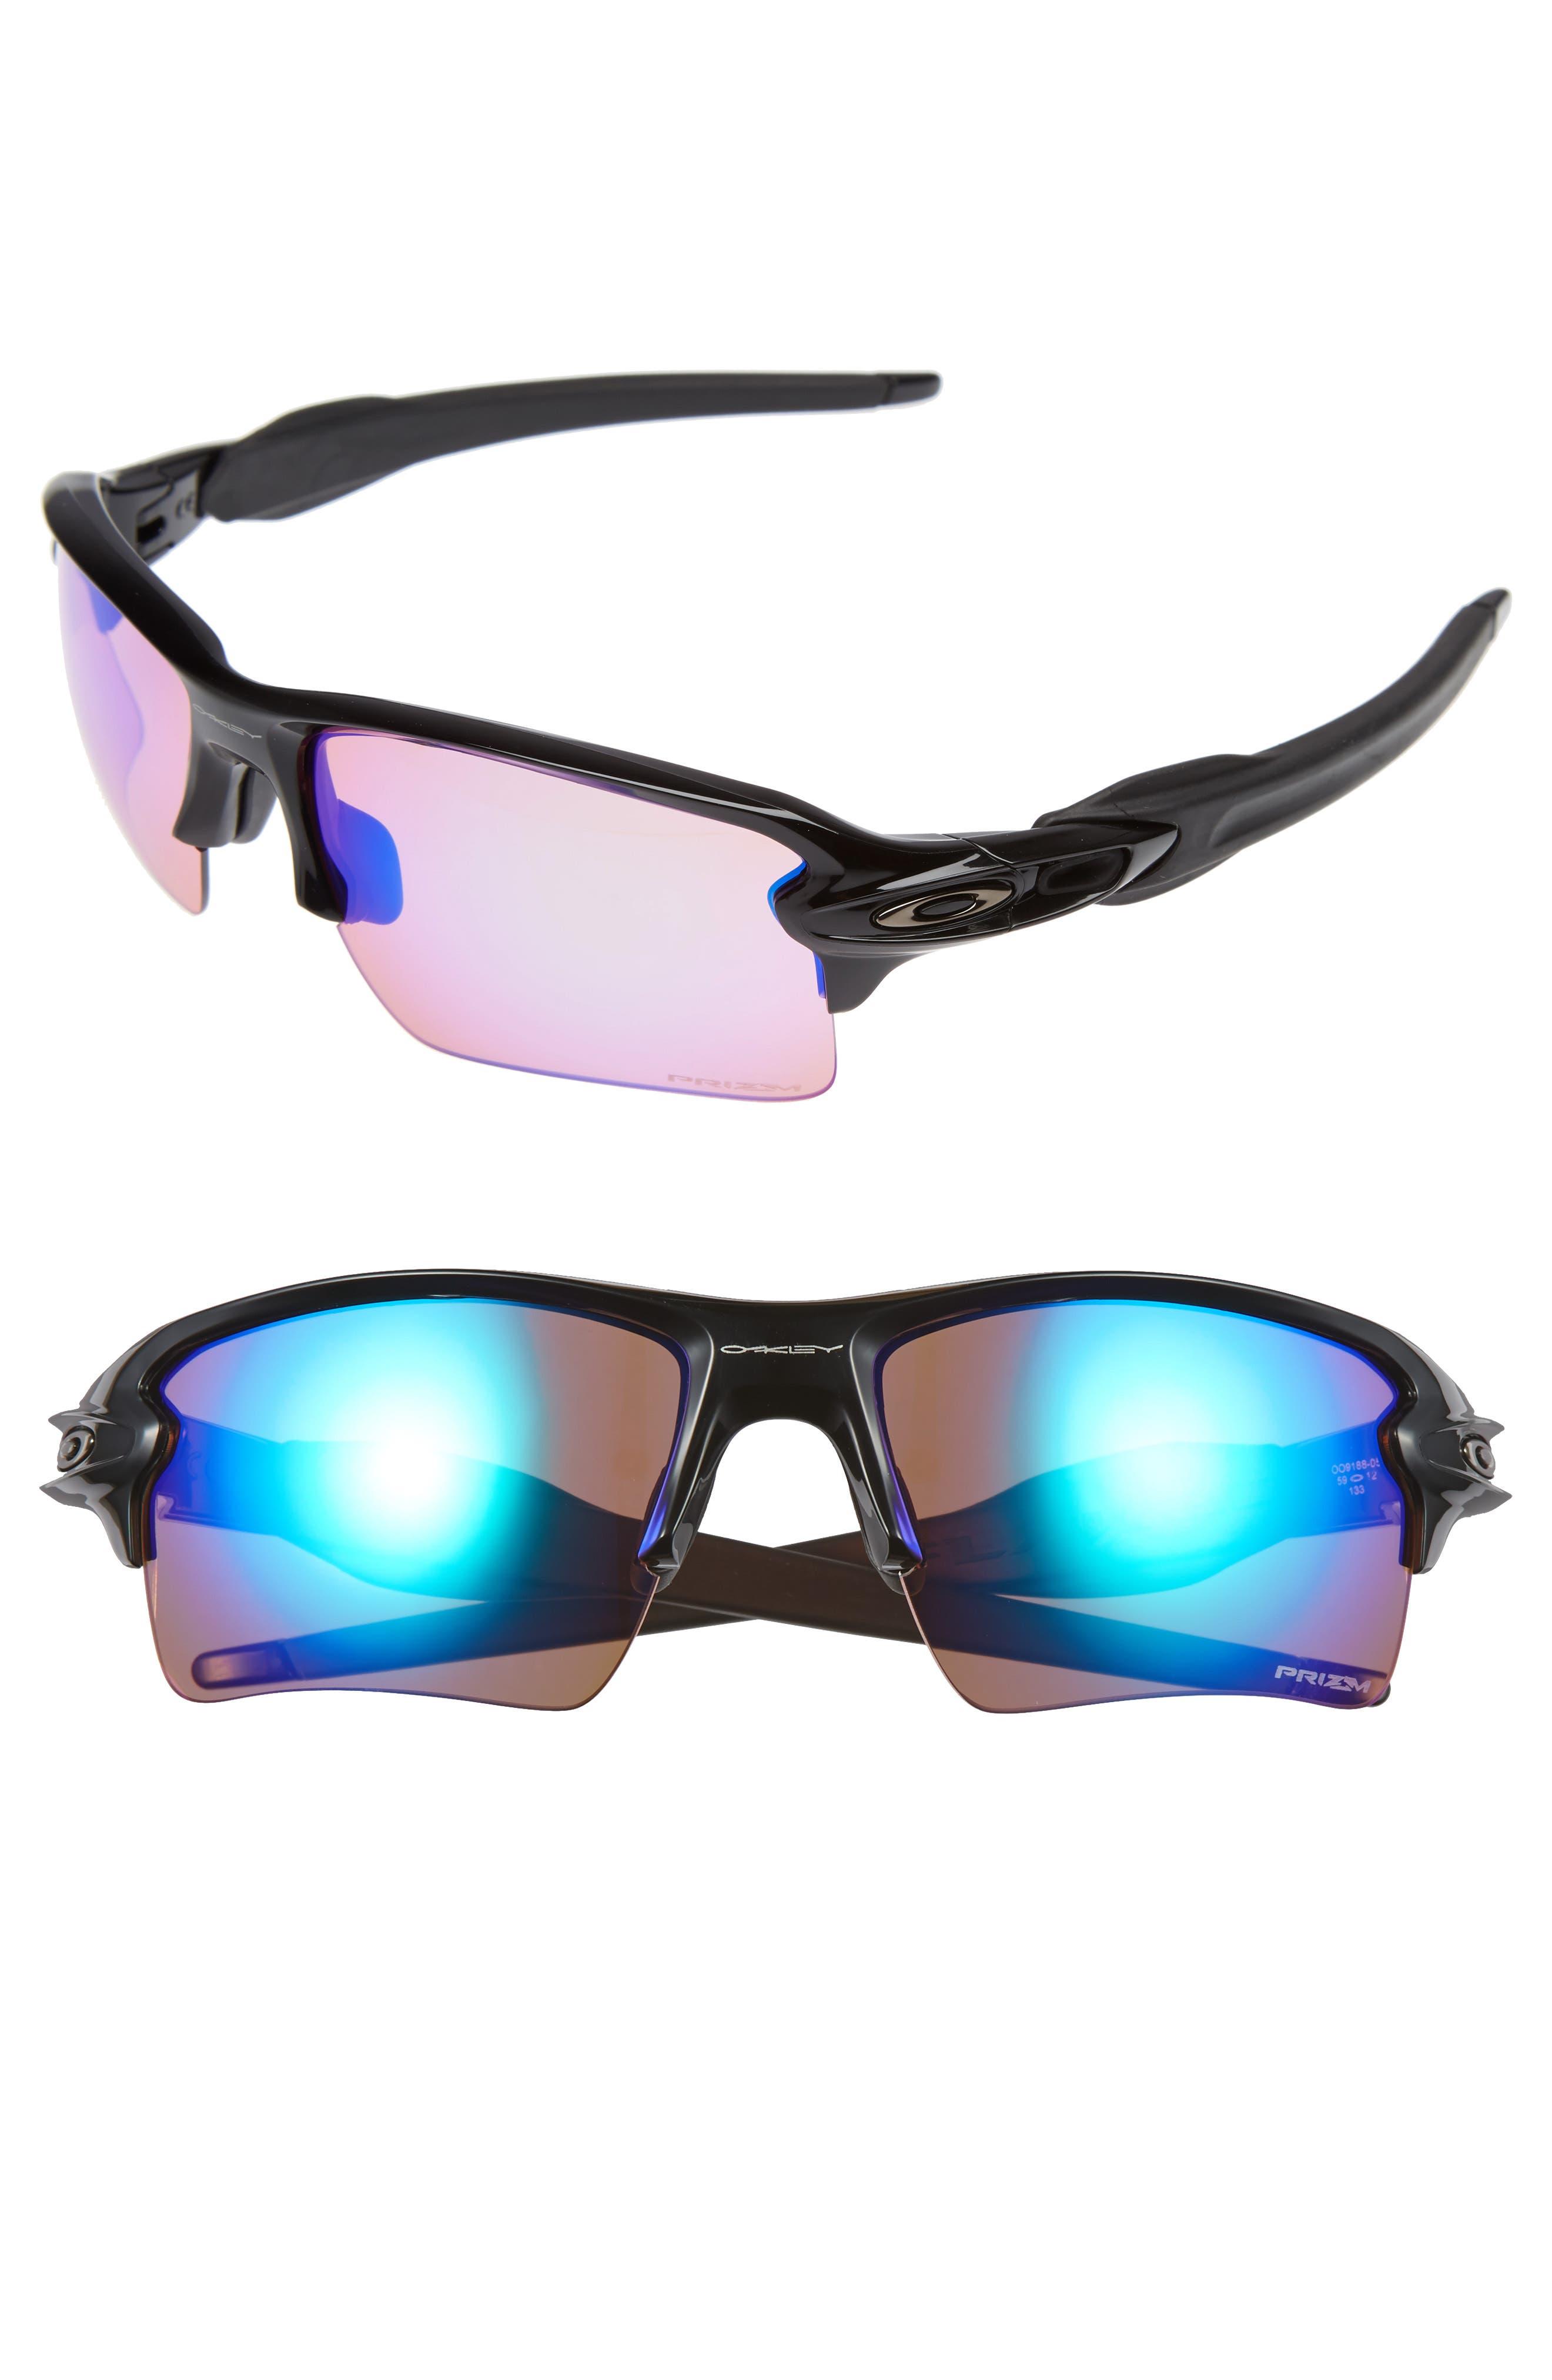 Oakley Flak 2.0 XL 59mm Sunglasses